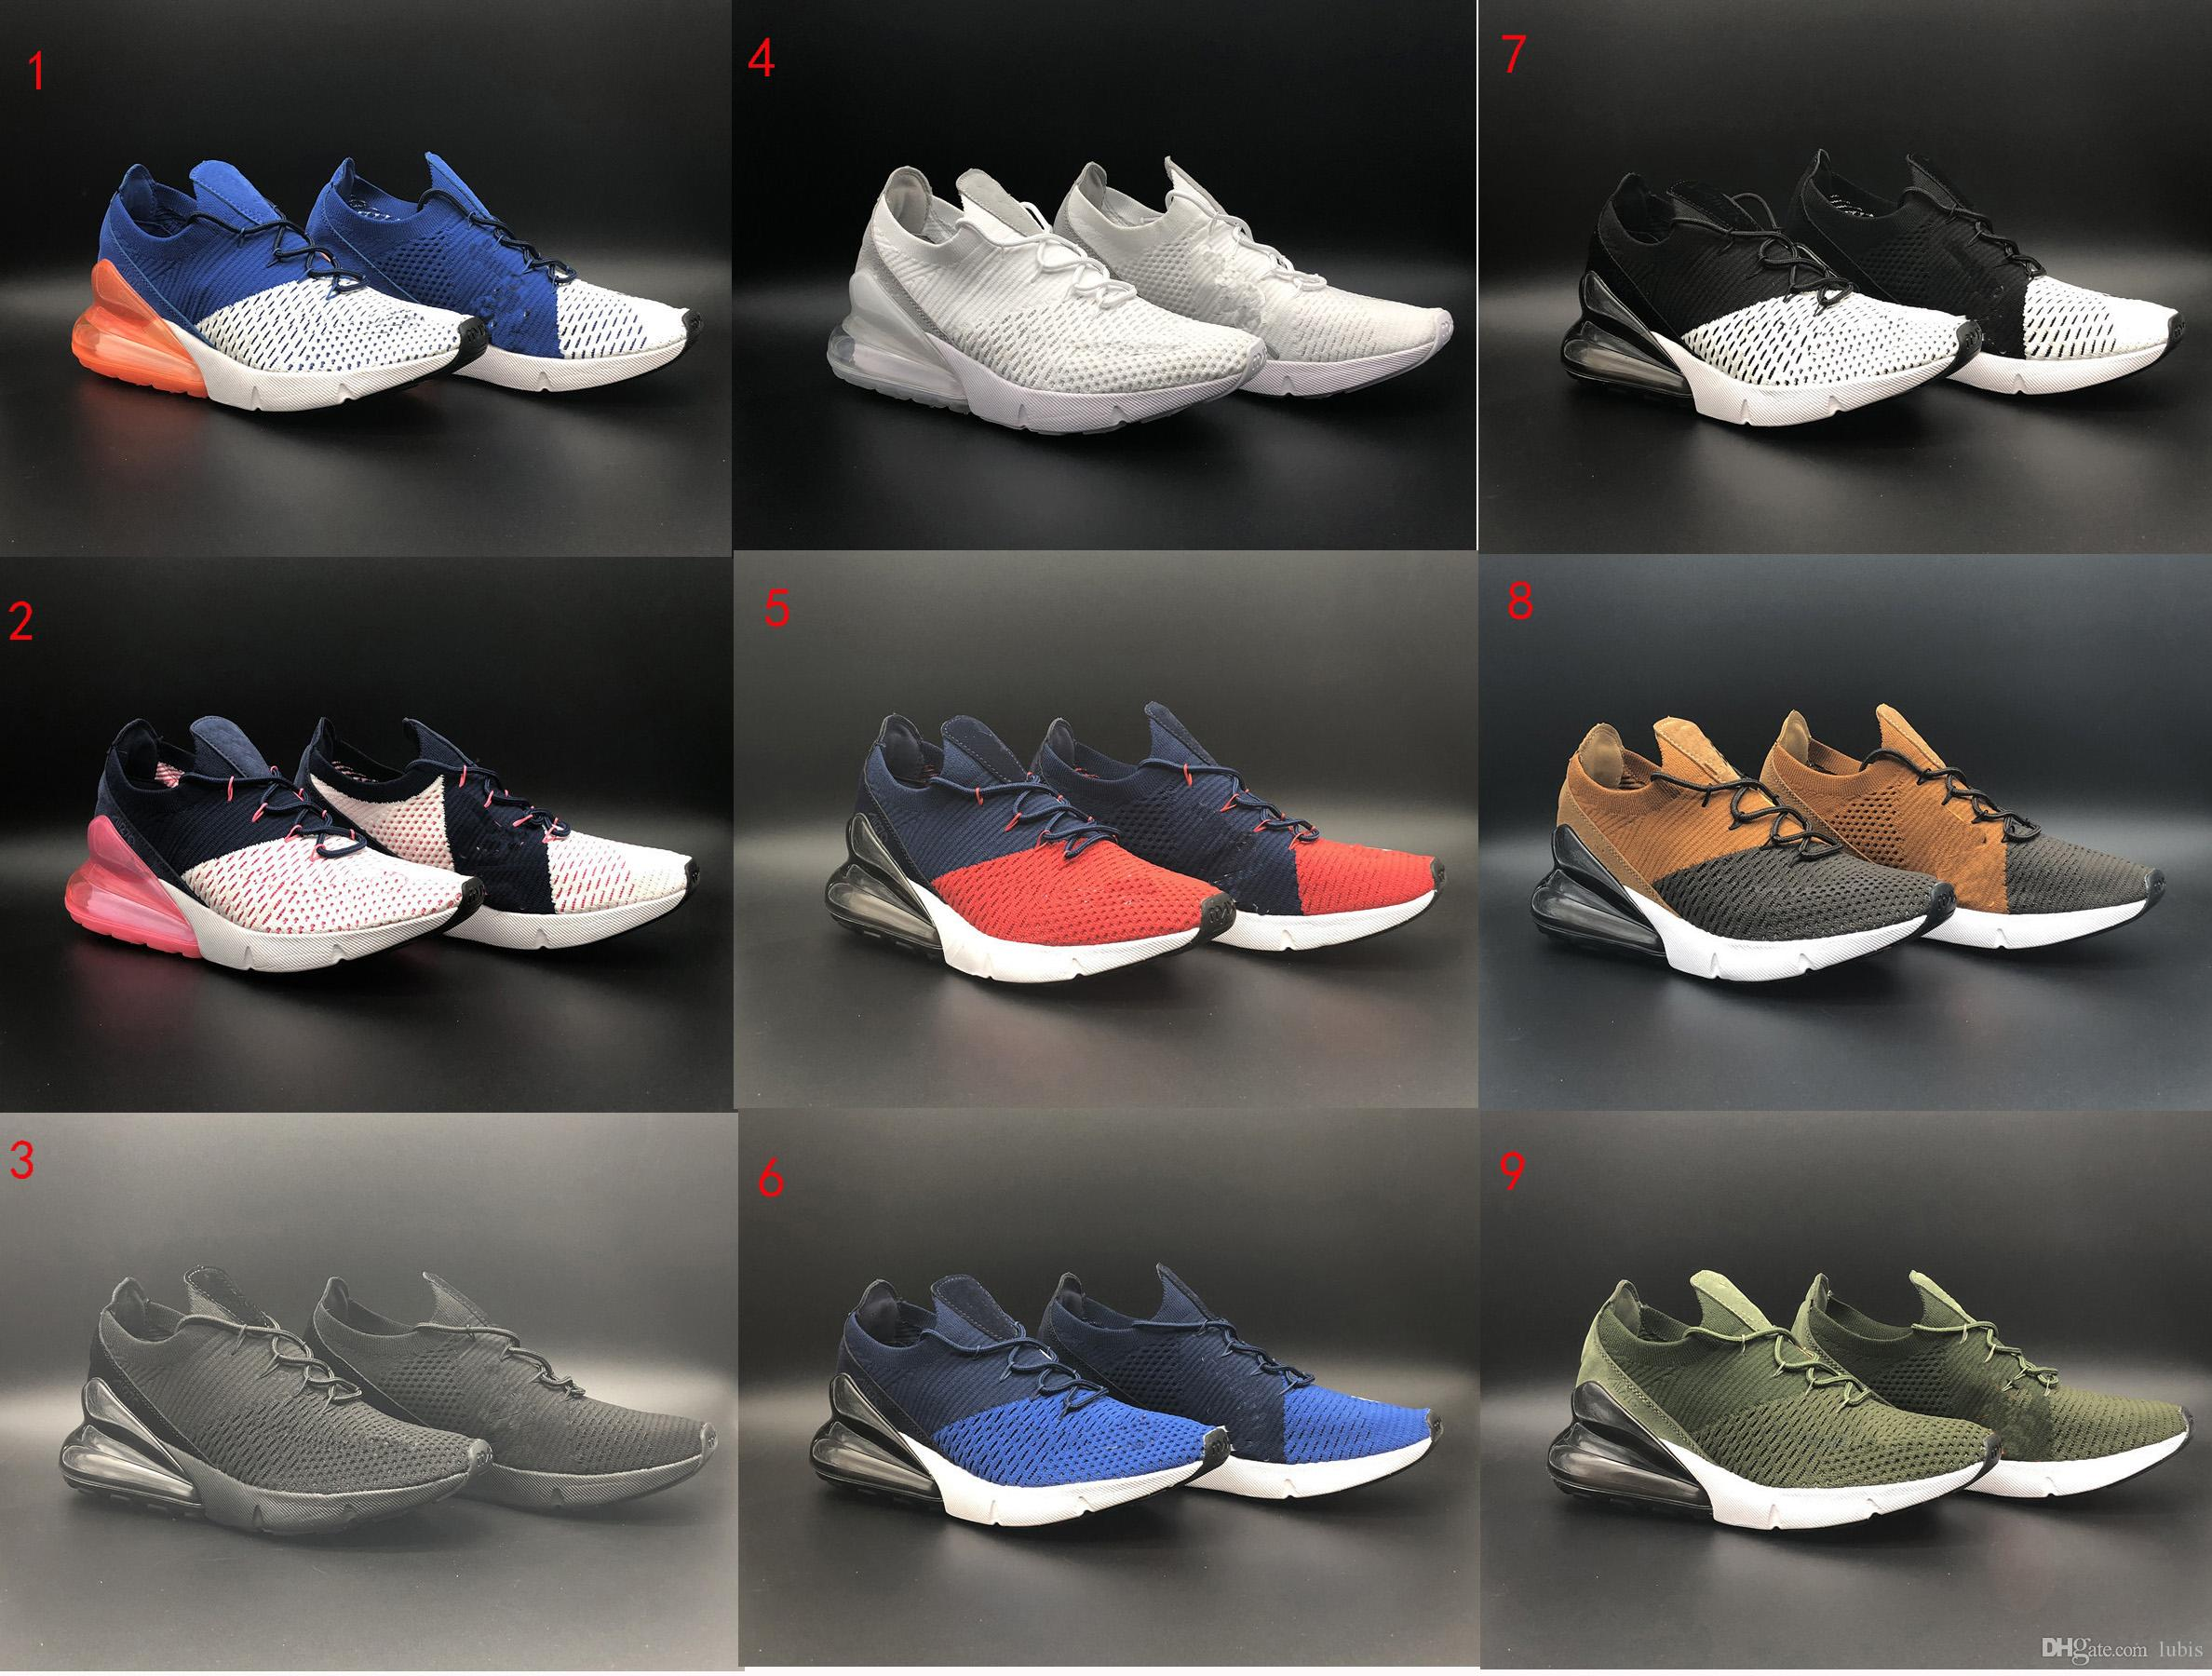 2018 top quality New 270 sport shoes men women walking shoes triple black 270 trainer shoes athletic sneakers size 36-45 18211 For sale online for cheap cheap online bXl96qhtH